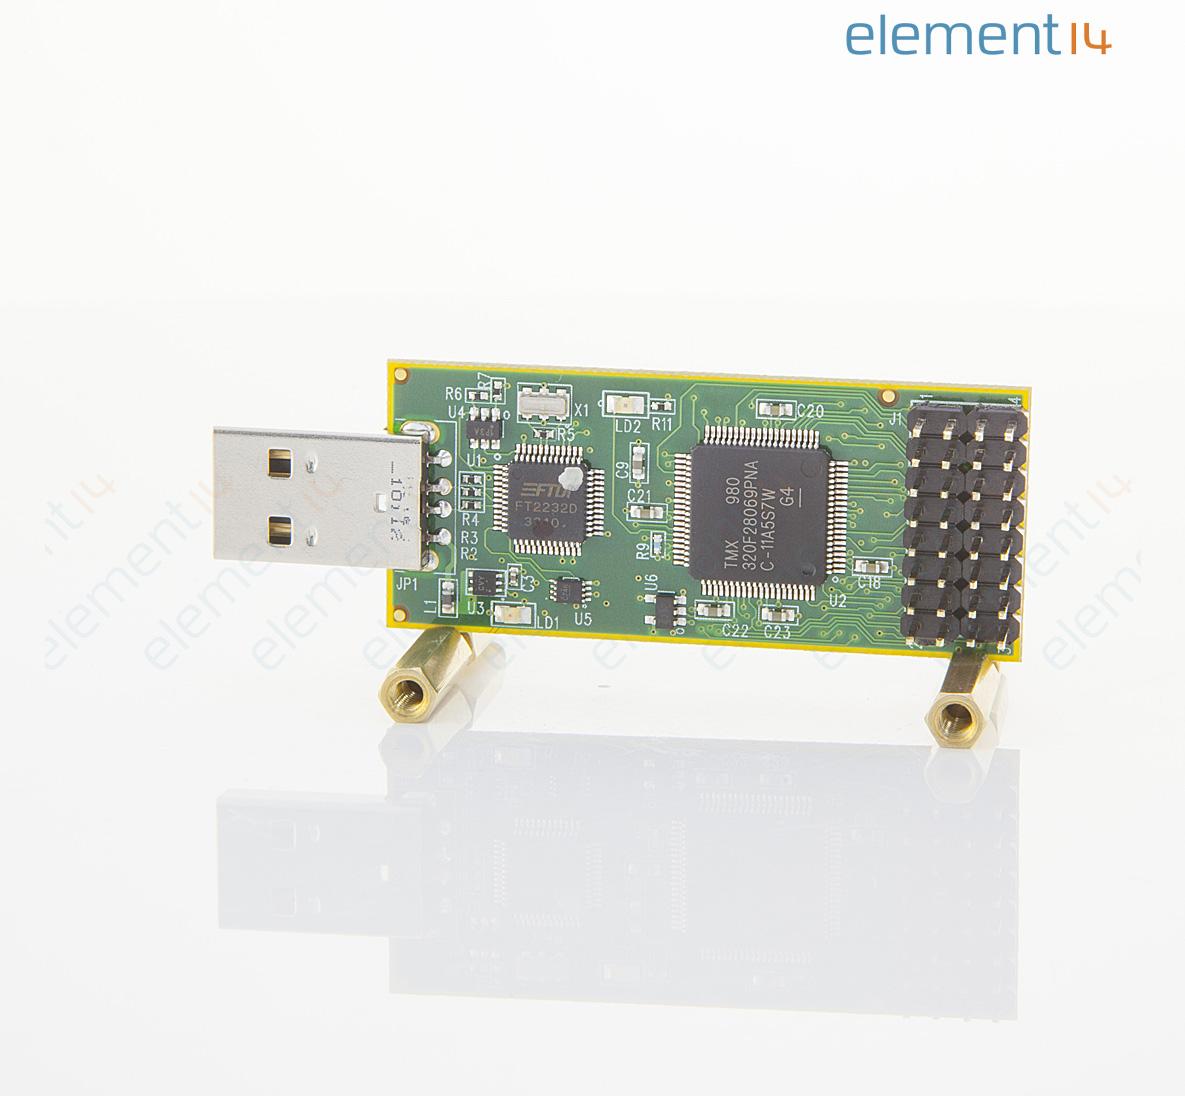 Tmdx28069usb Texas Instruments Piccolo Controlstick Usb C2000 32 Digital Power Control Bit Mcu Richmedia 13759kb En